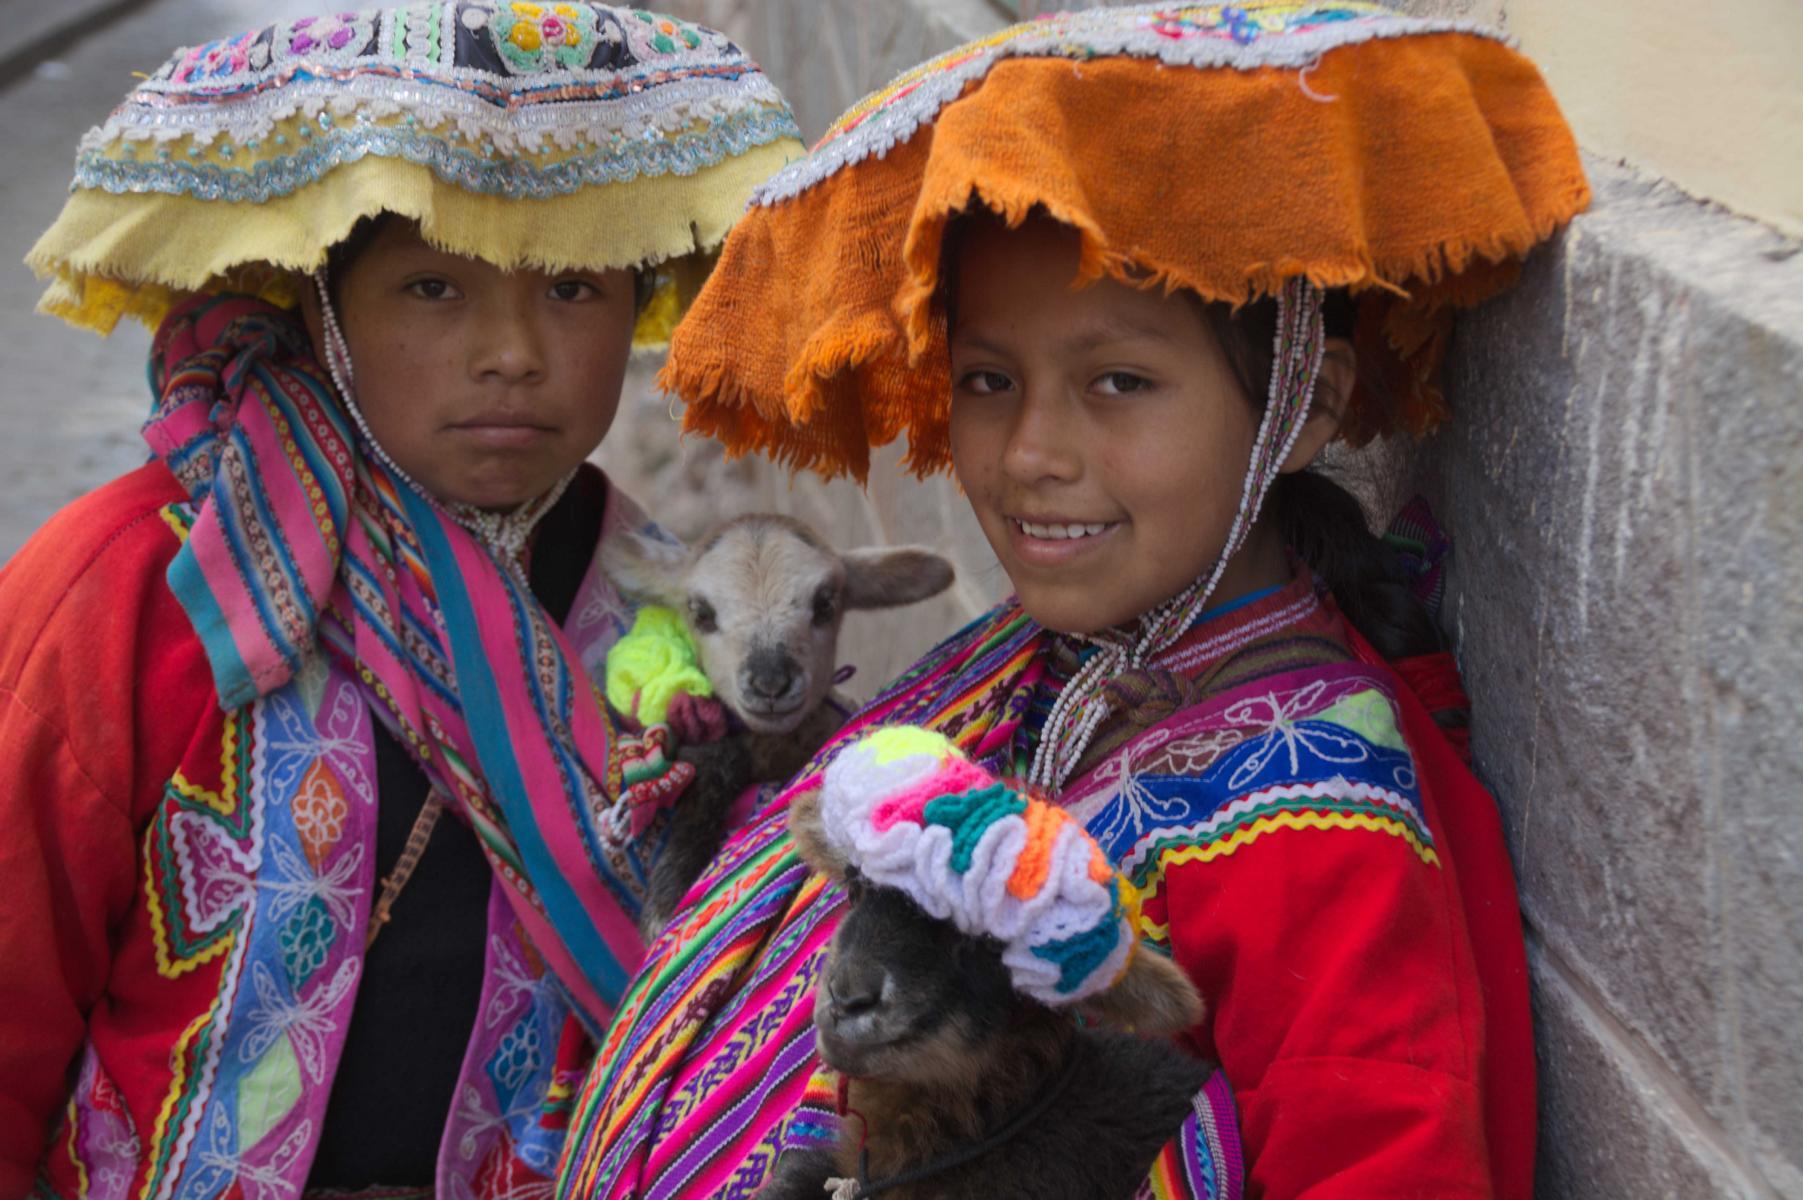 K1600_Peruanenrinnen